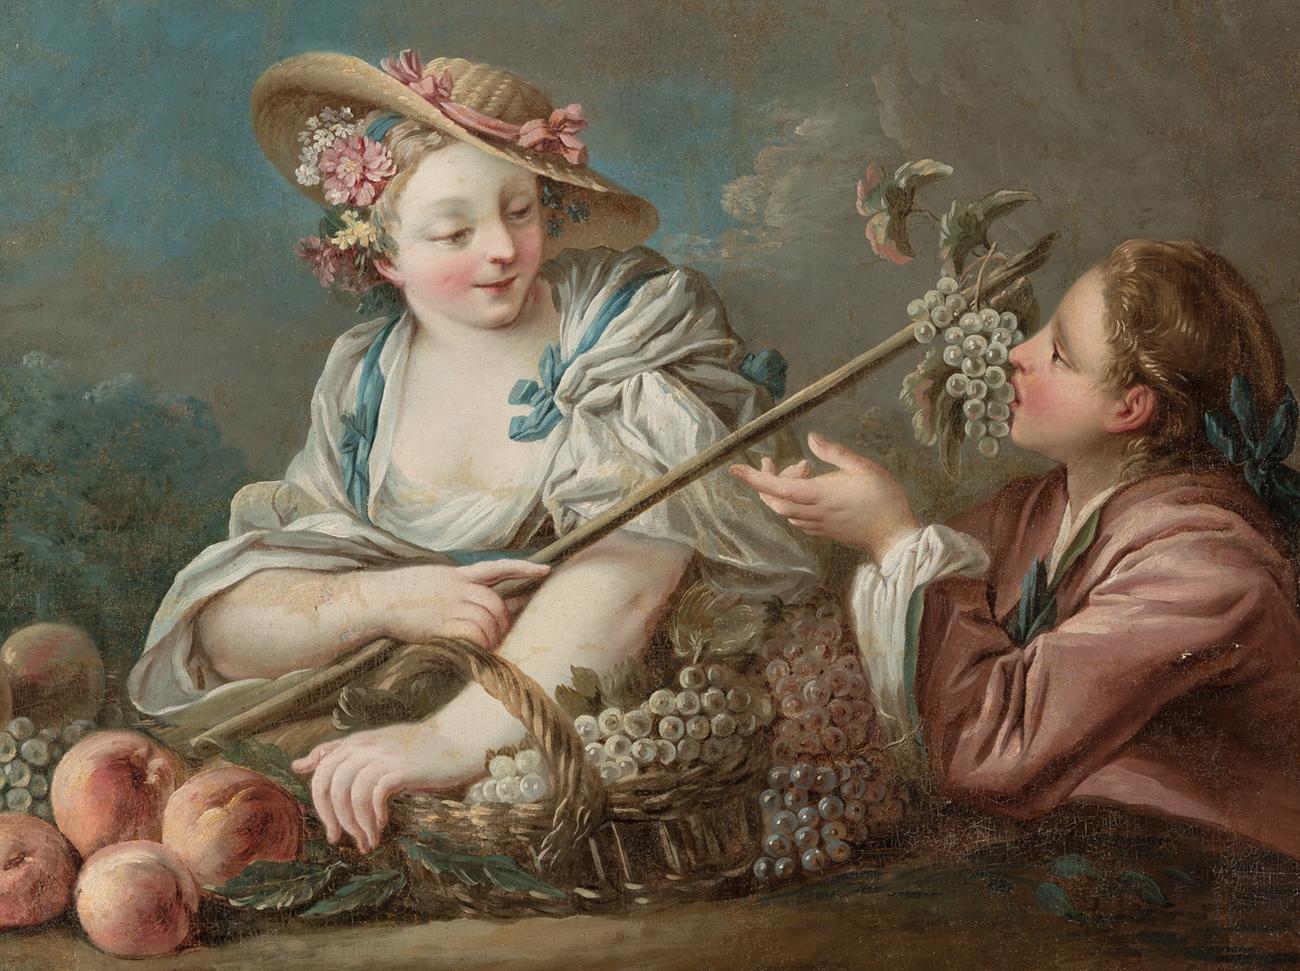 Escuela francesa siglo XVIII.Oleo sobre lienzo.